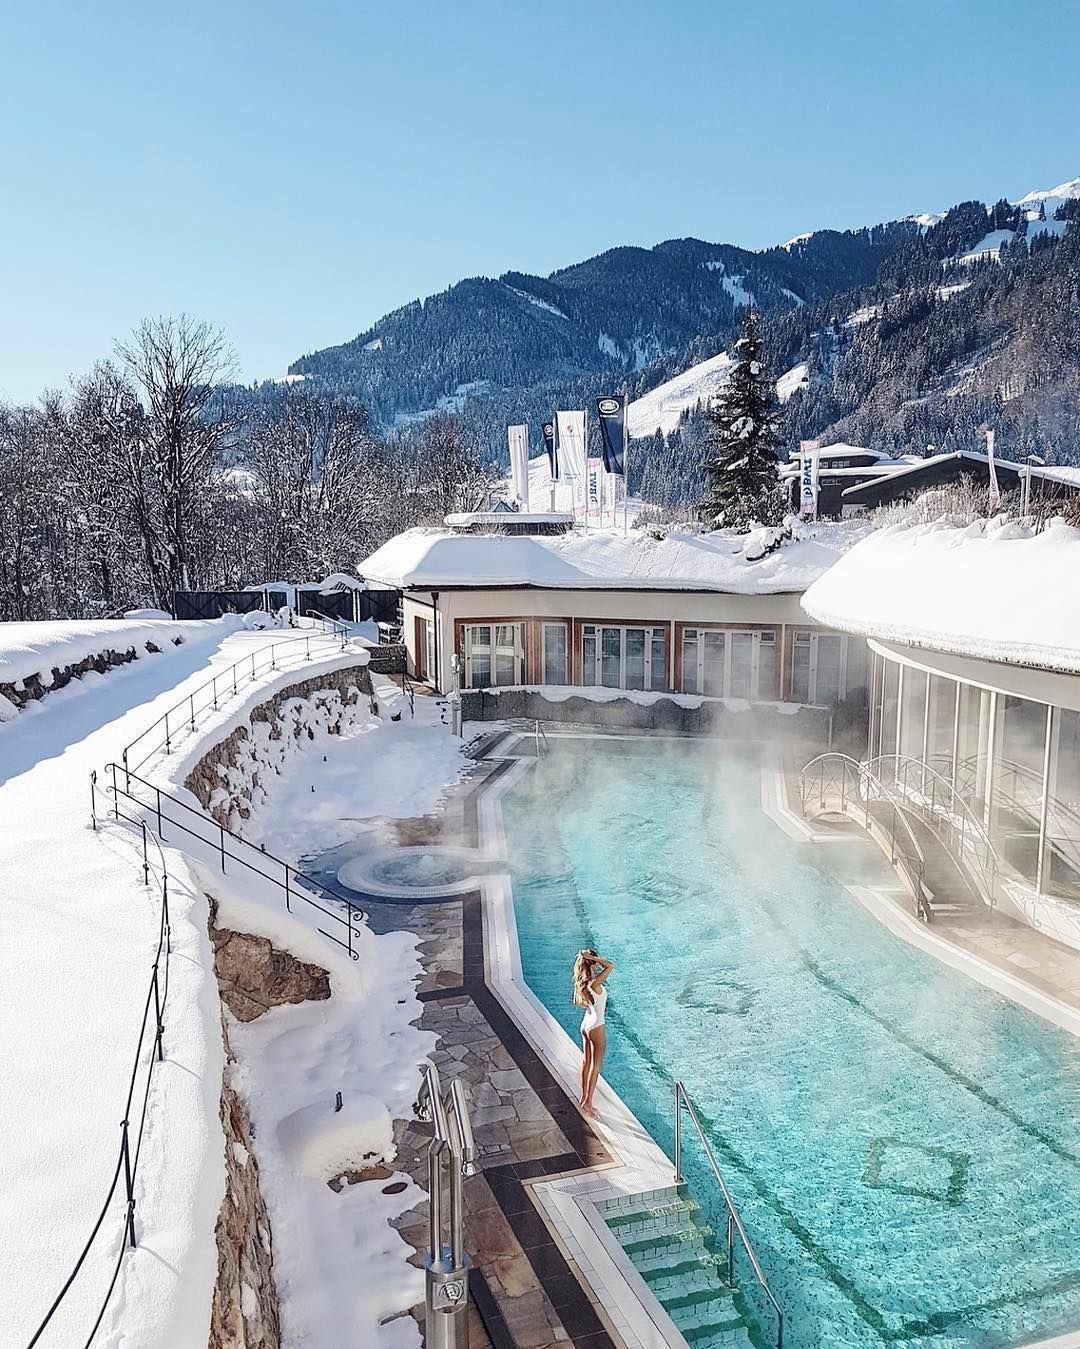 Buy Windproof Softshell Fleece Ski Jacket 3 In 1 Outdoor Sports Coat Best Hotels Holiday Travel Relaxing Vacations [ 1349 x 1080 Pixel ]